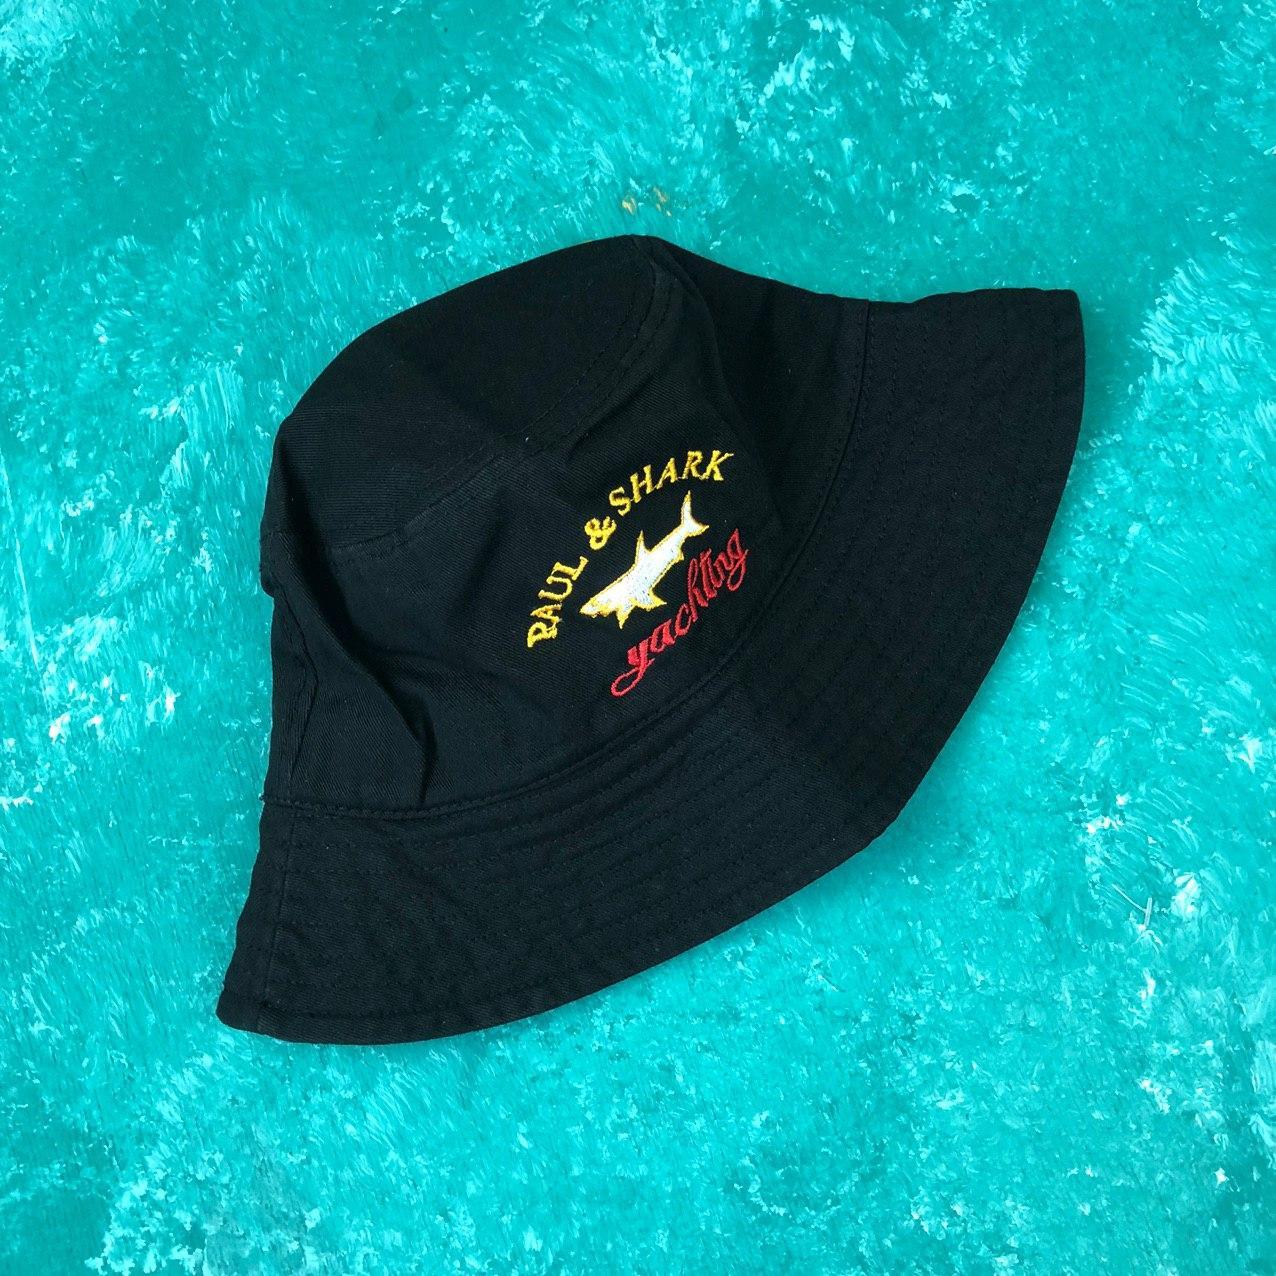 Панама Paul Shark Чорна 56-58